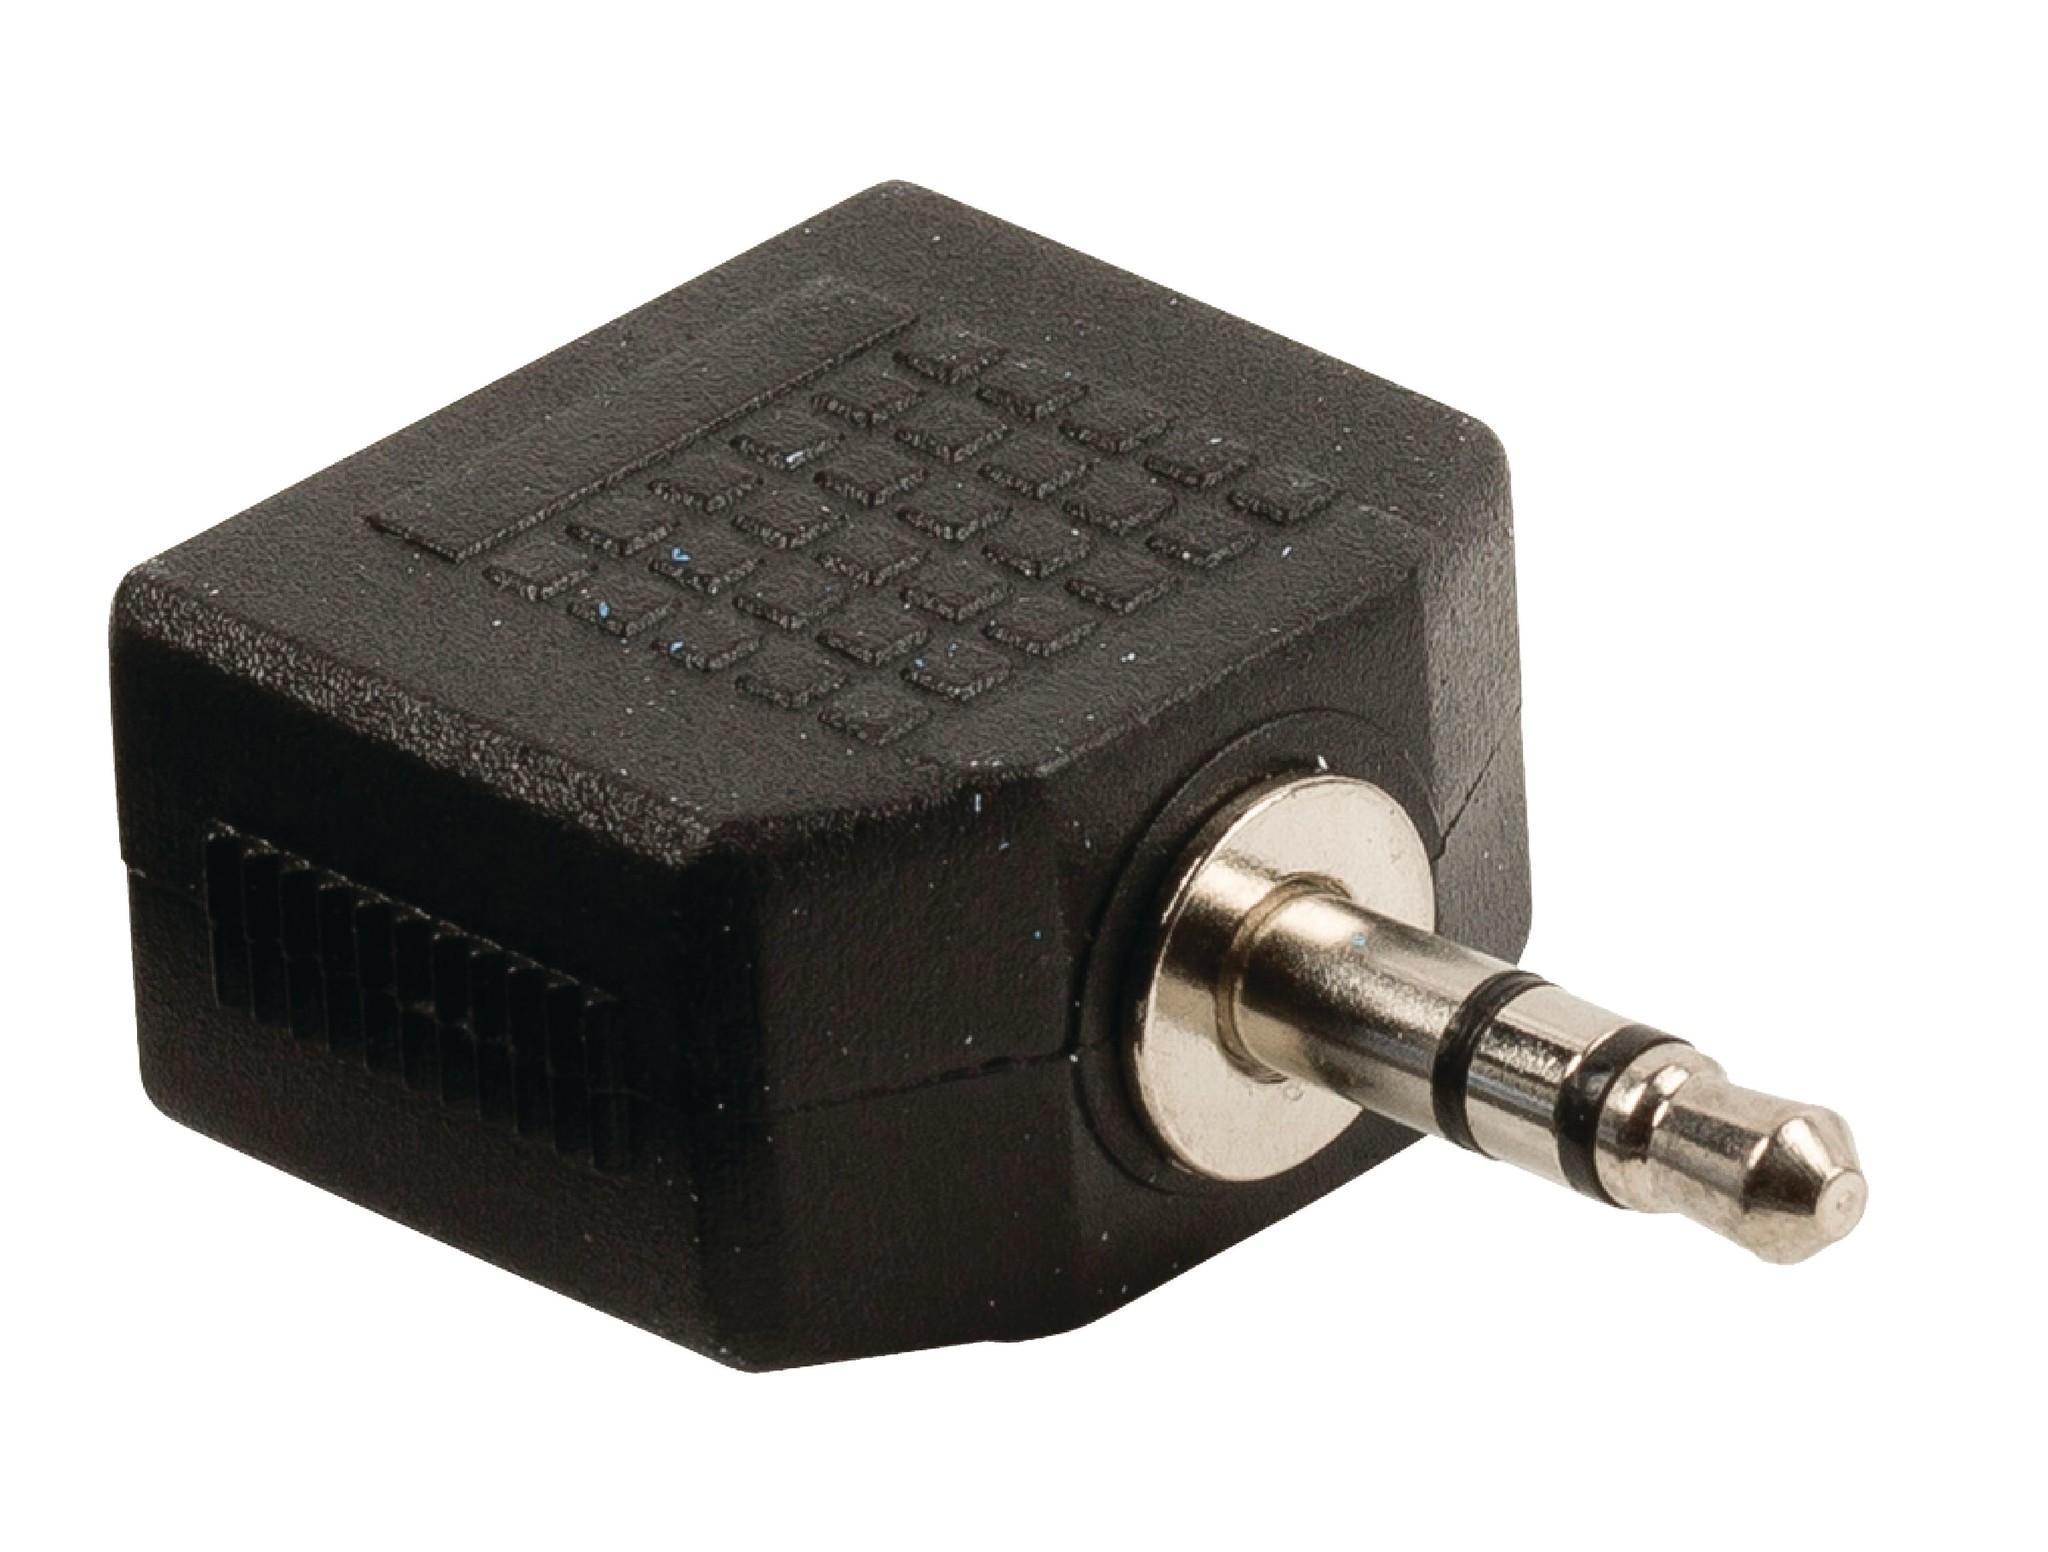 nedis Stereo-Audio-Adapter 3.5 mm Male - 2x 3.5 mm Female Zwart